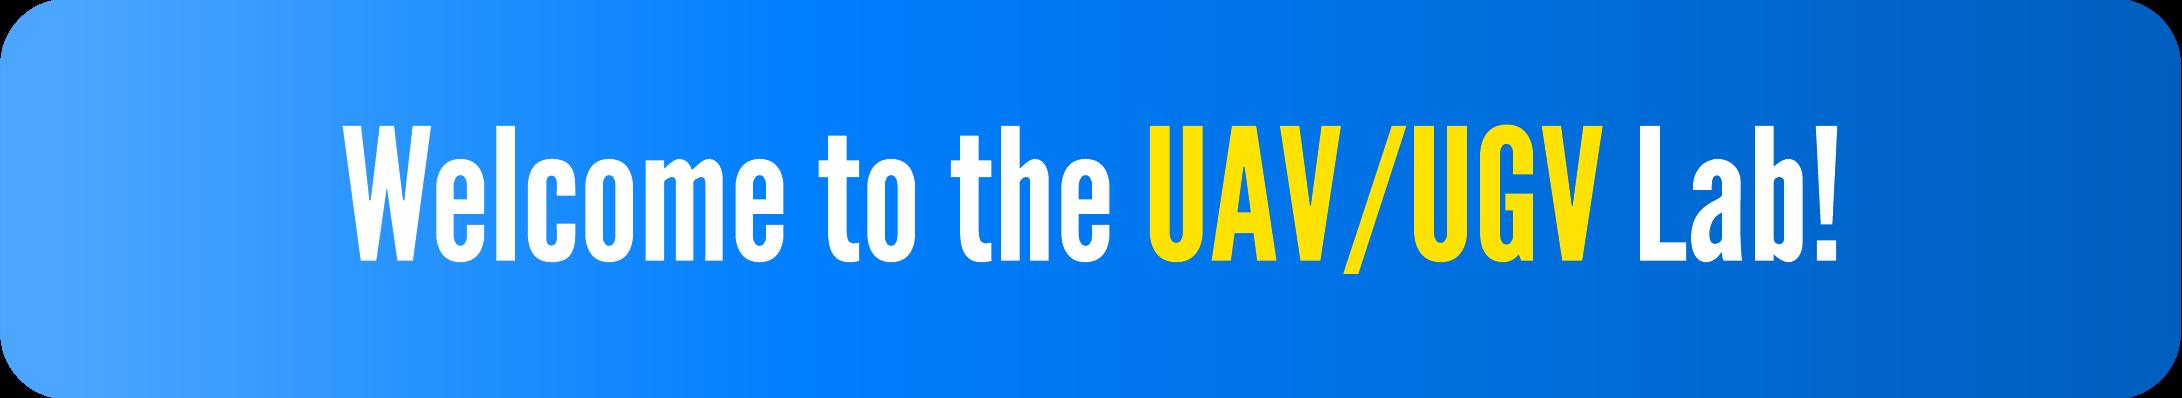 Welcome to the UAV/UGV Lab!